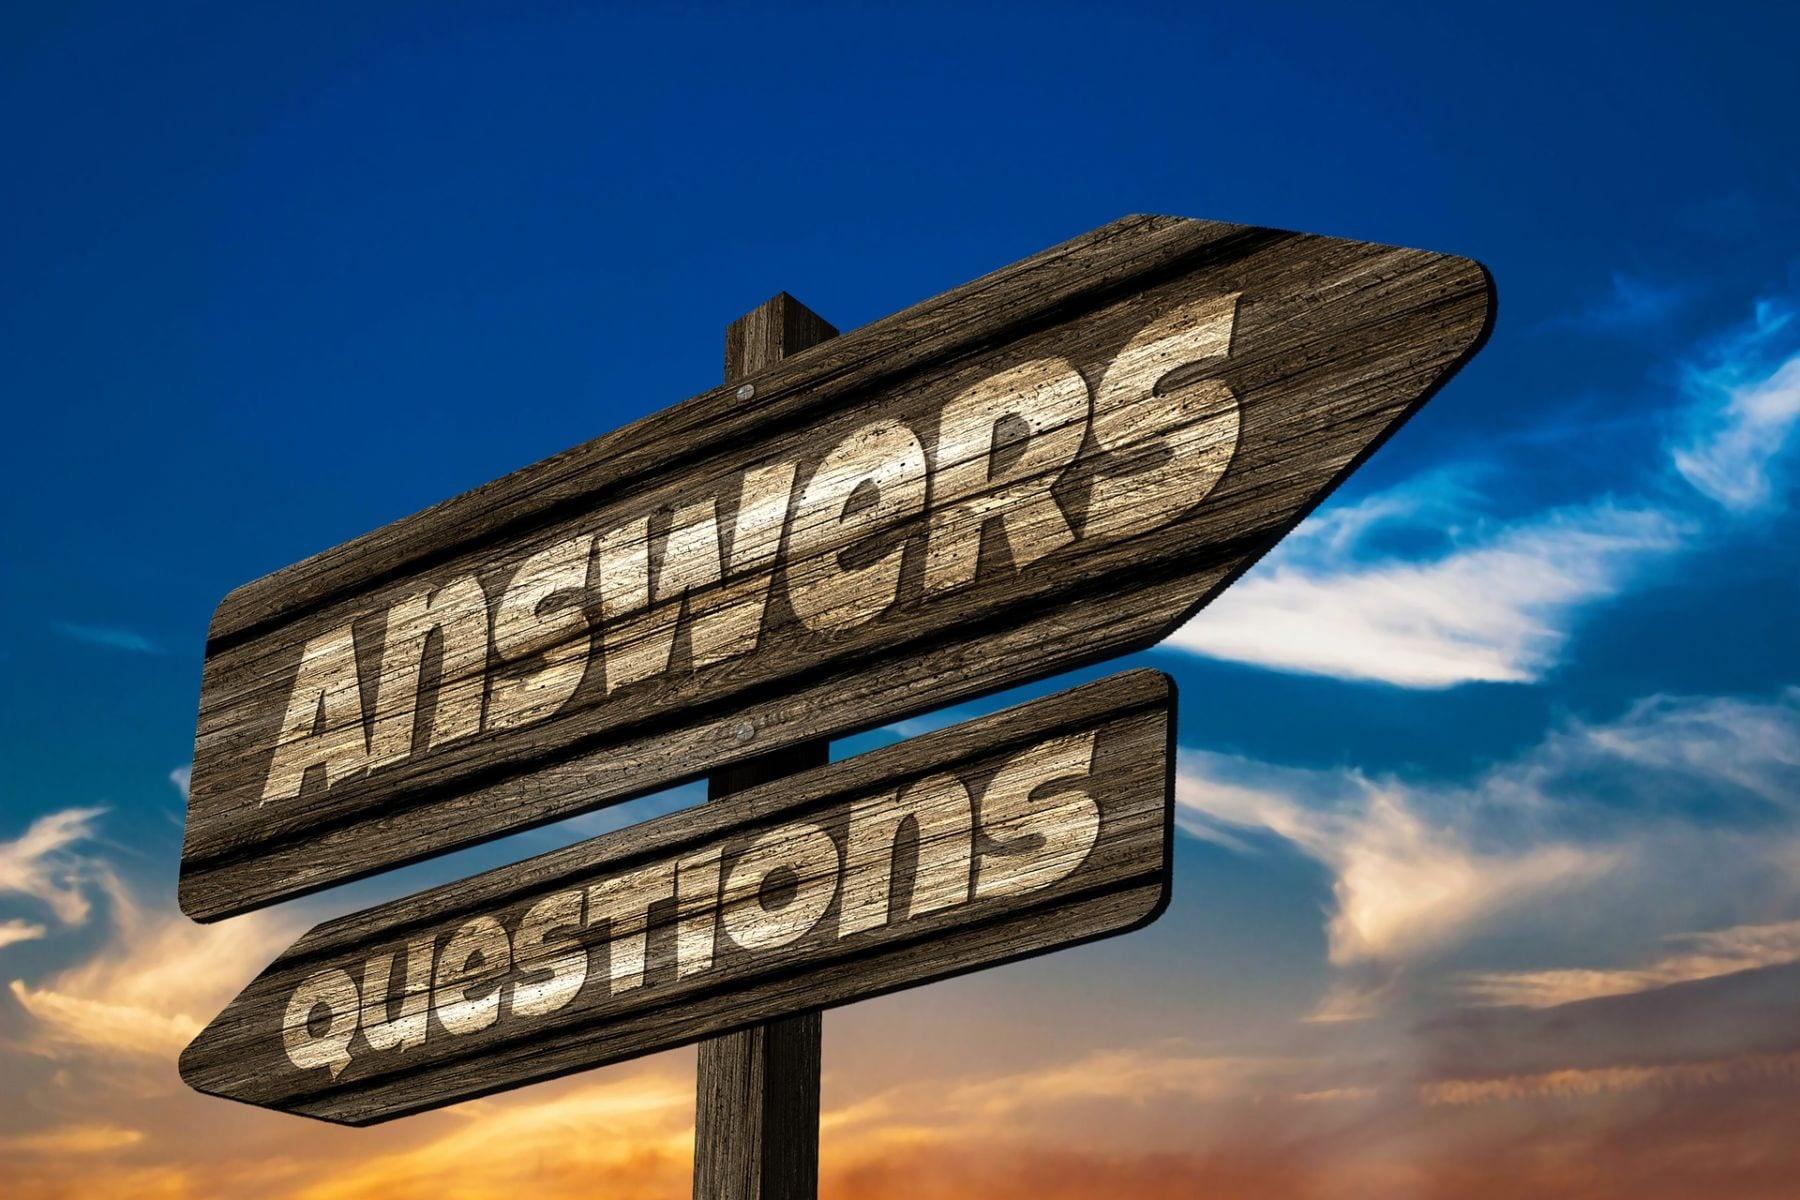 Questions & Answers Season 4